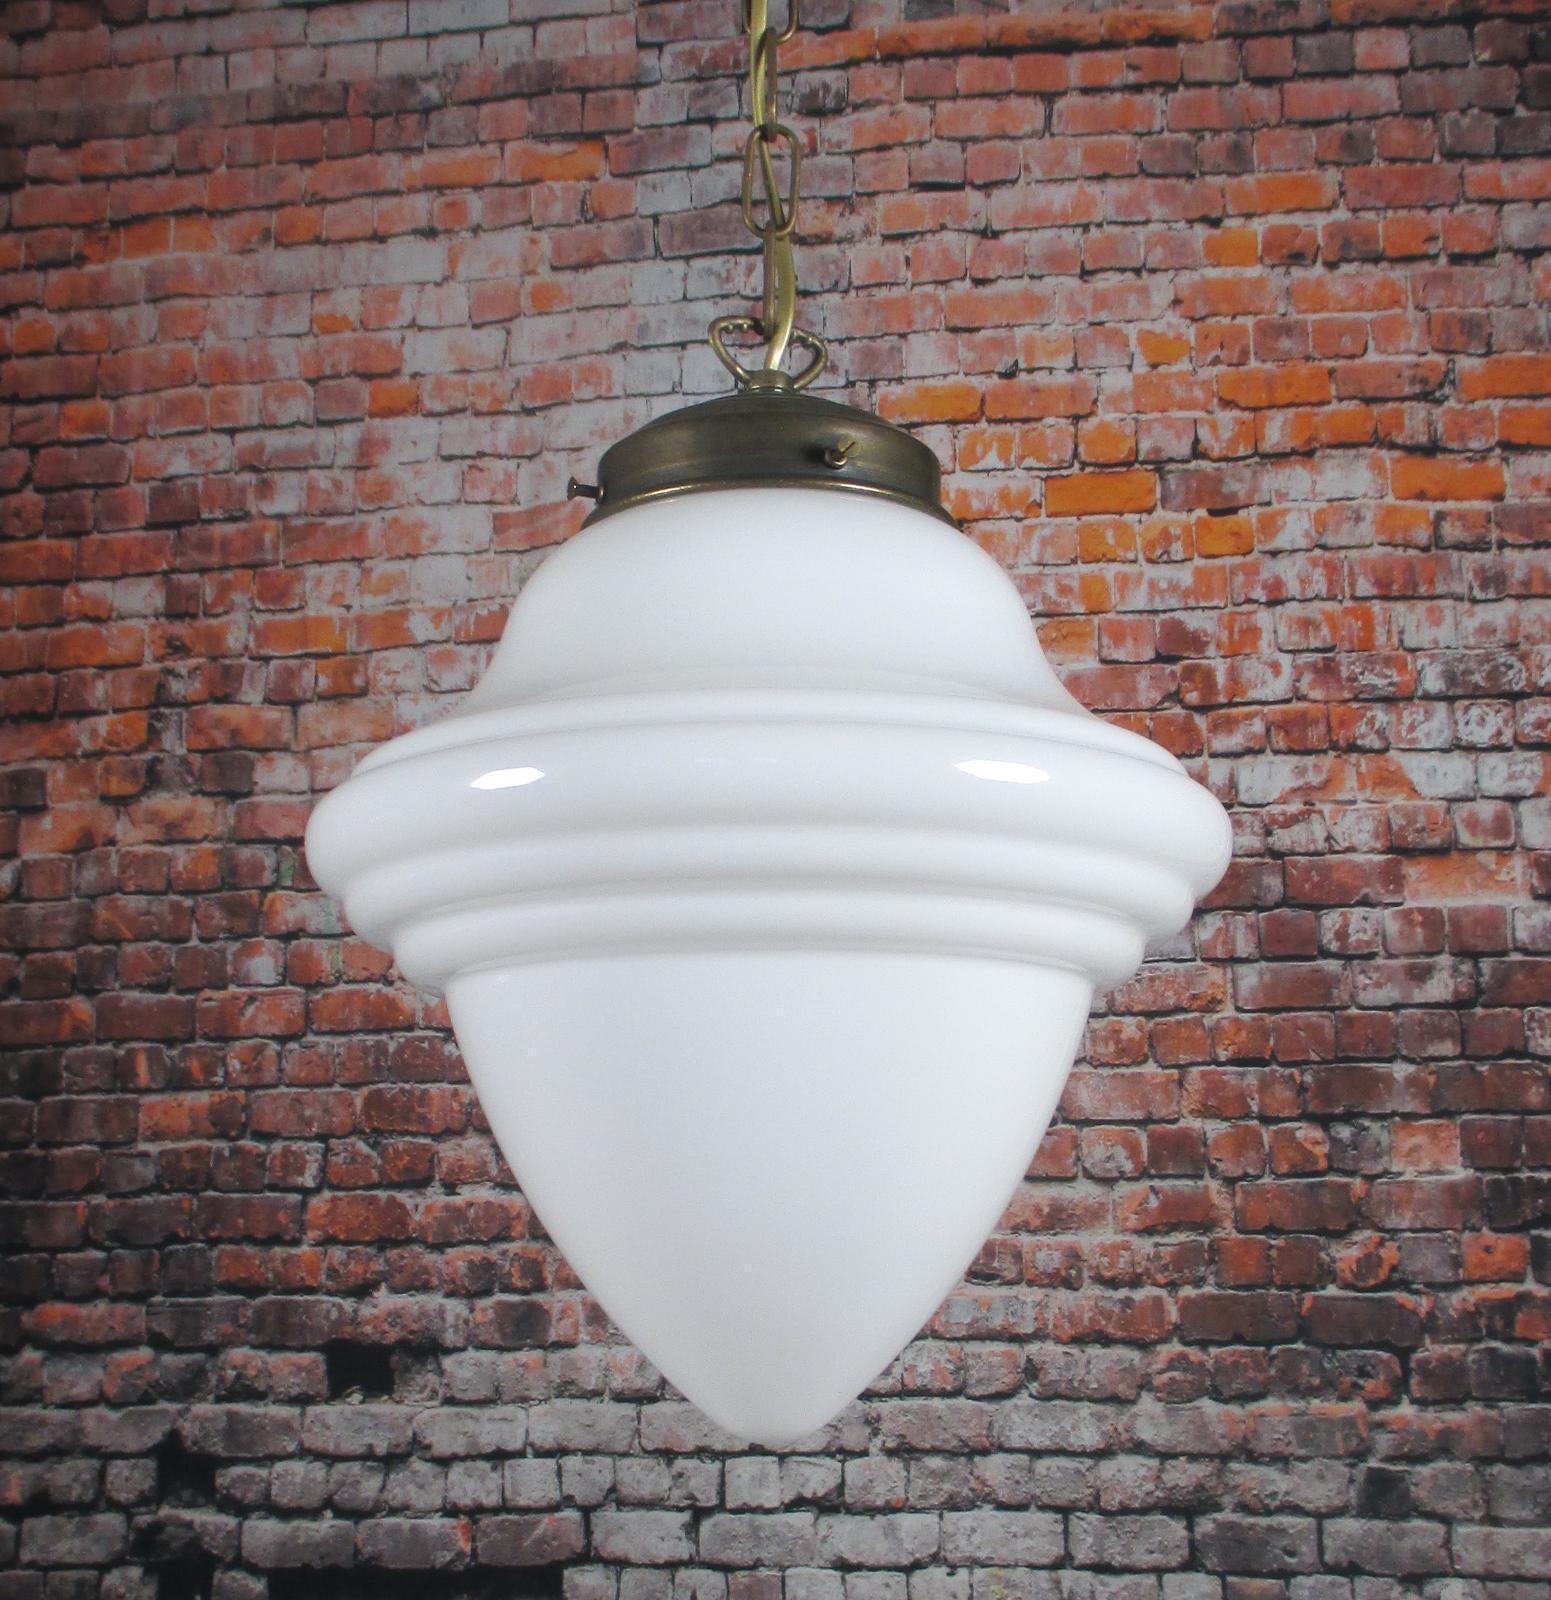 Hängelampe XXL Weiß Jugendstil Opal-Glas Tropfen Lampe Antik Messing Pendellampe